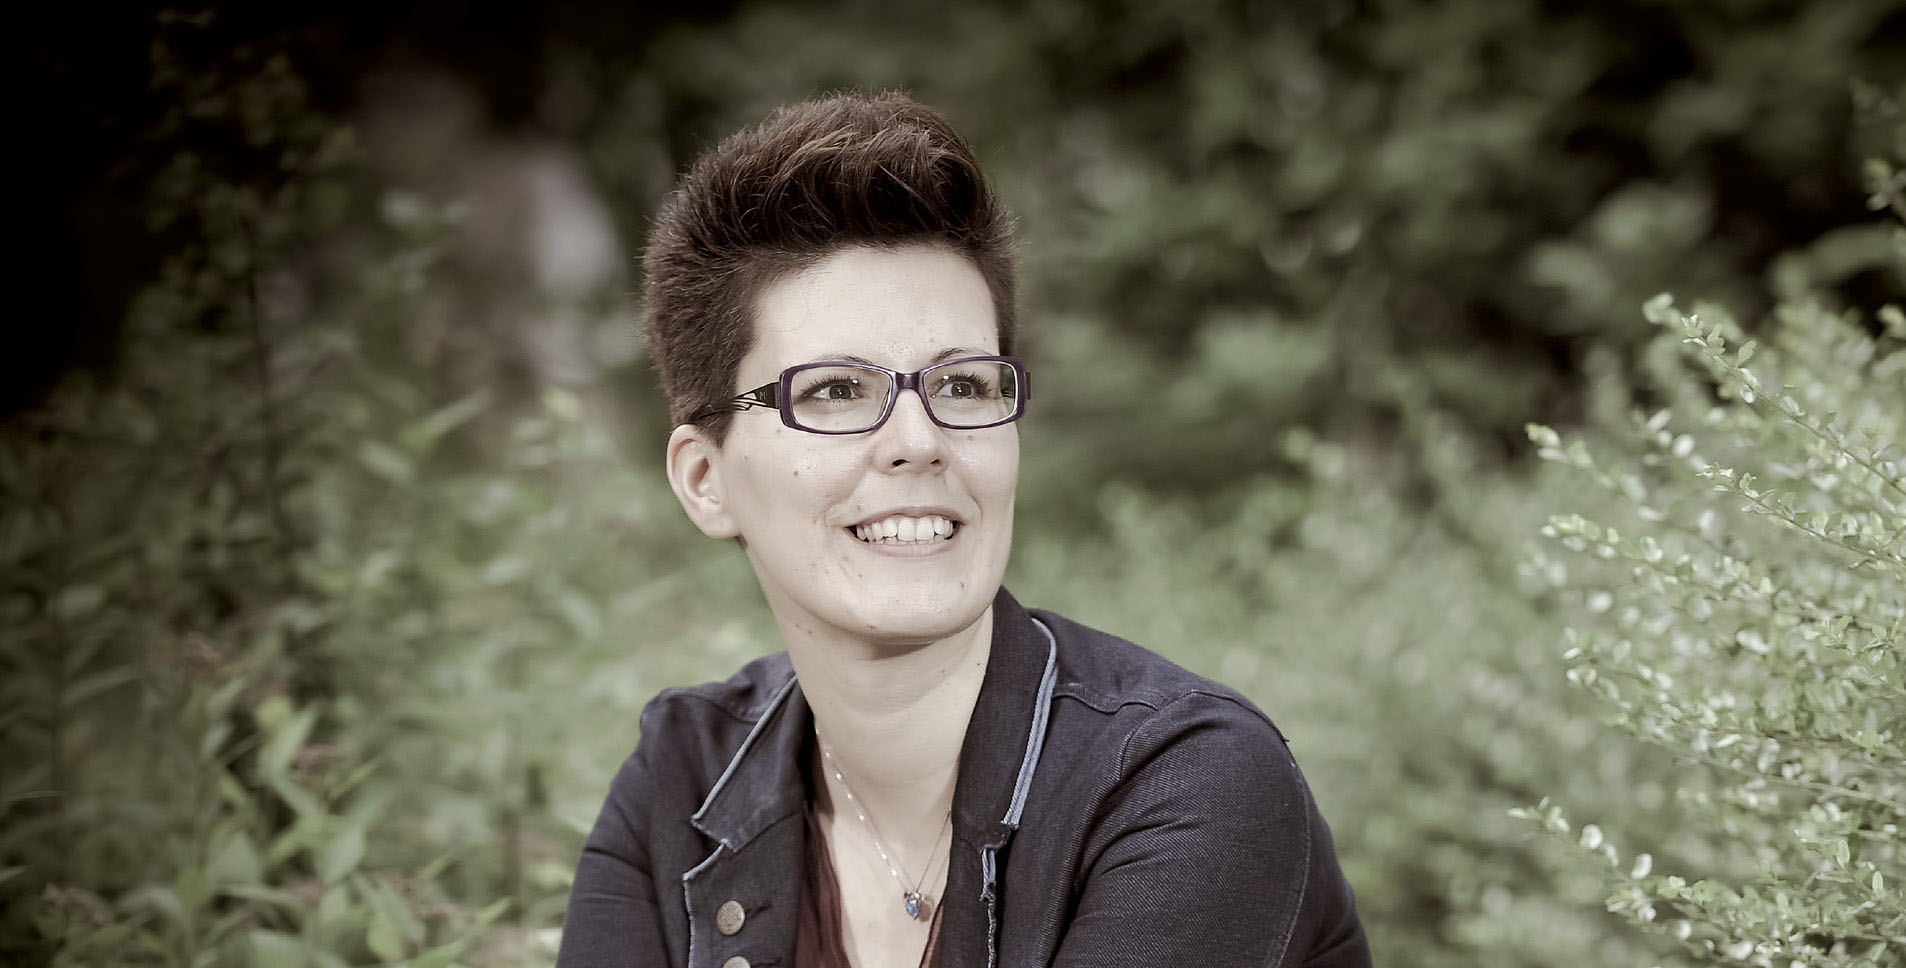 INTERVJU Maruška Vizek: 'Lex Agrokor je pokazatelj ortačkog kapitalizma'